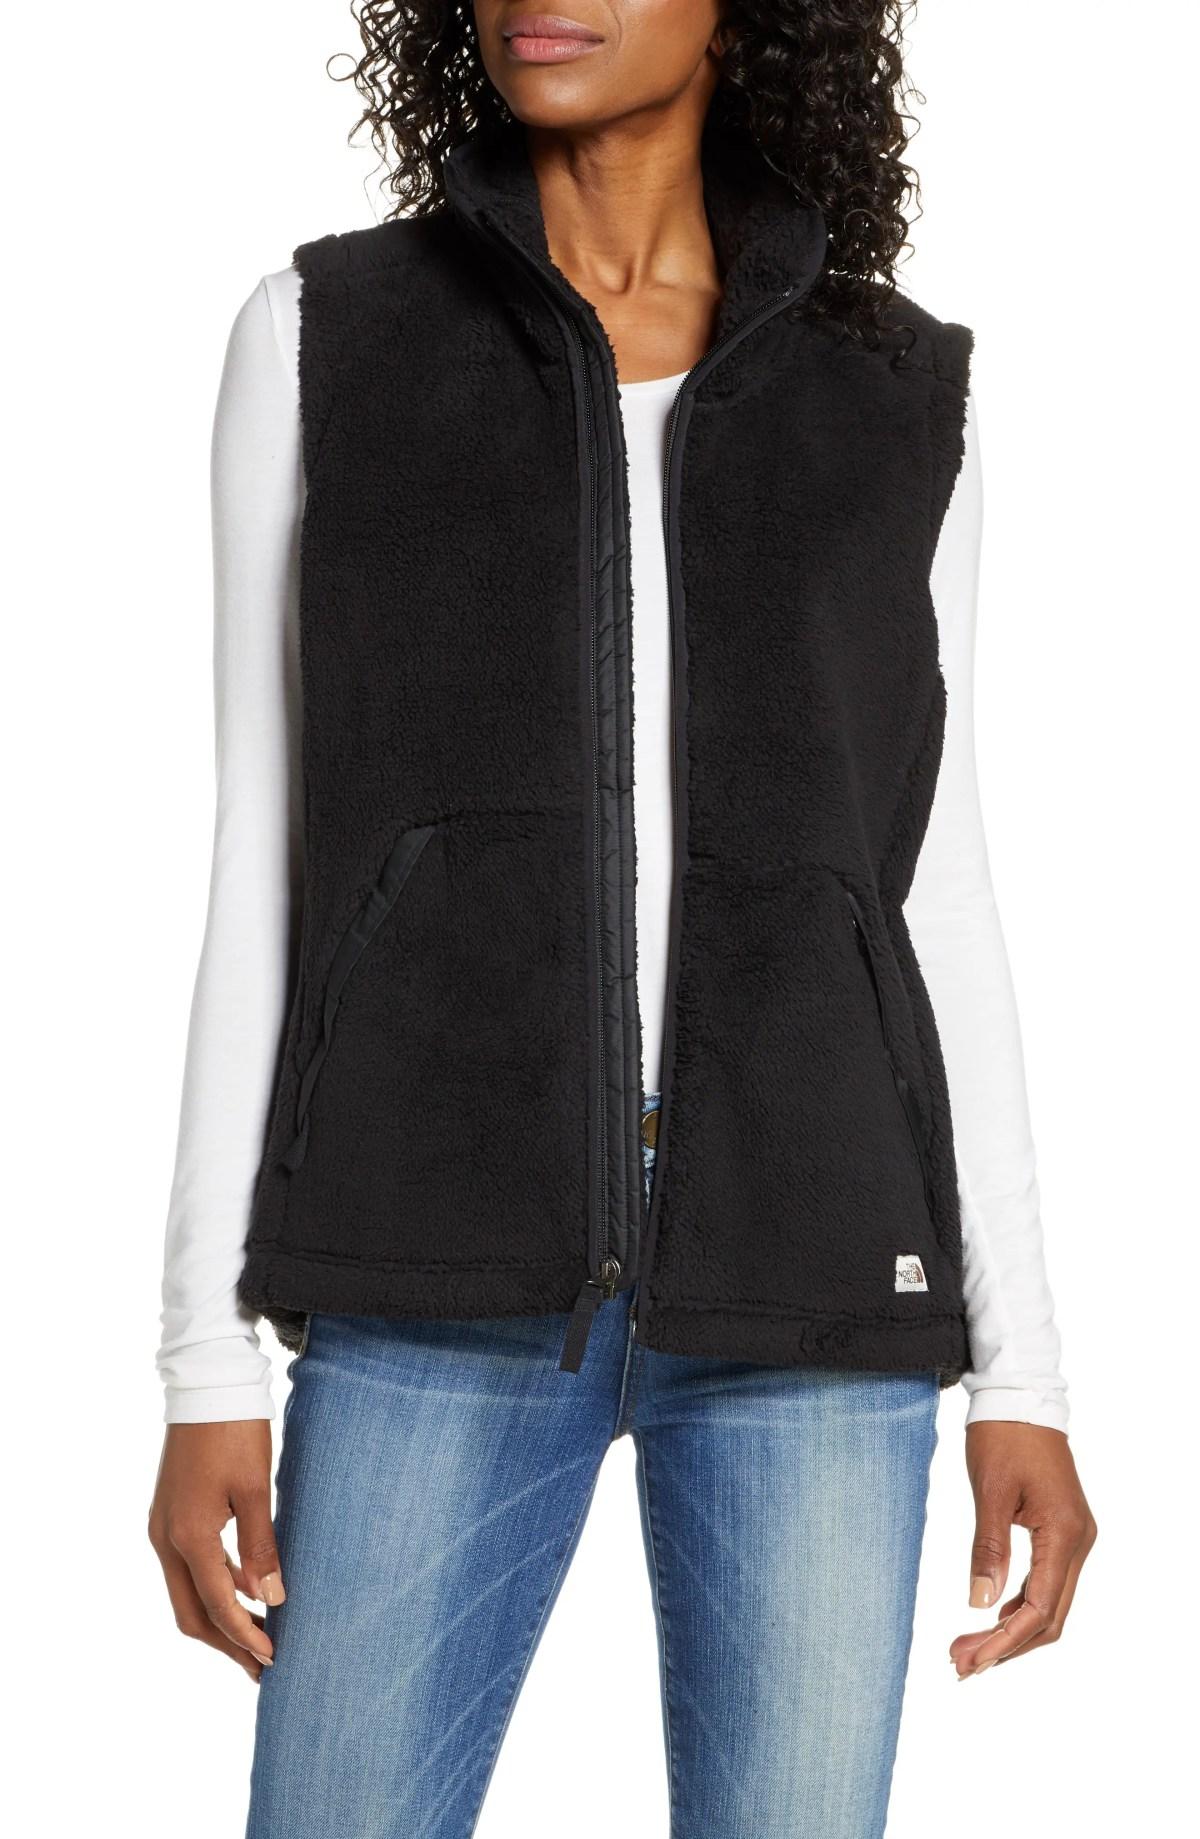 THE NORTH FACE Campshire 2.0 Fleece Vest, Main, color, TNF BLACK